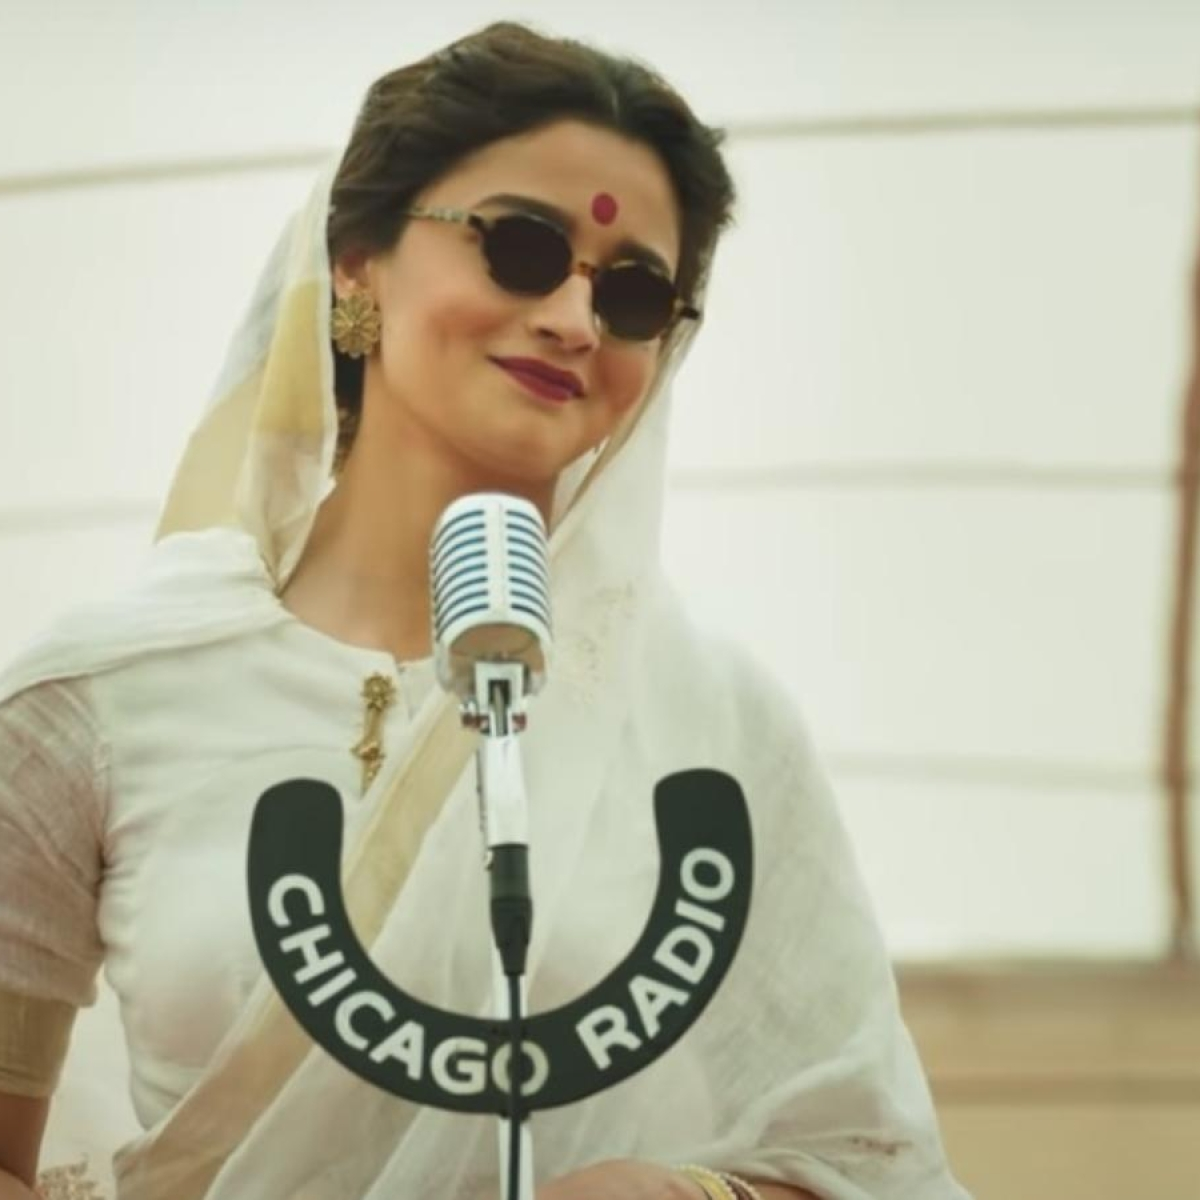 Congress MLA seeks change in Alia Bhatt's 'Gangubai Kathiawadi' film title